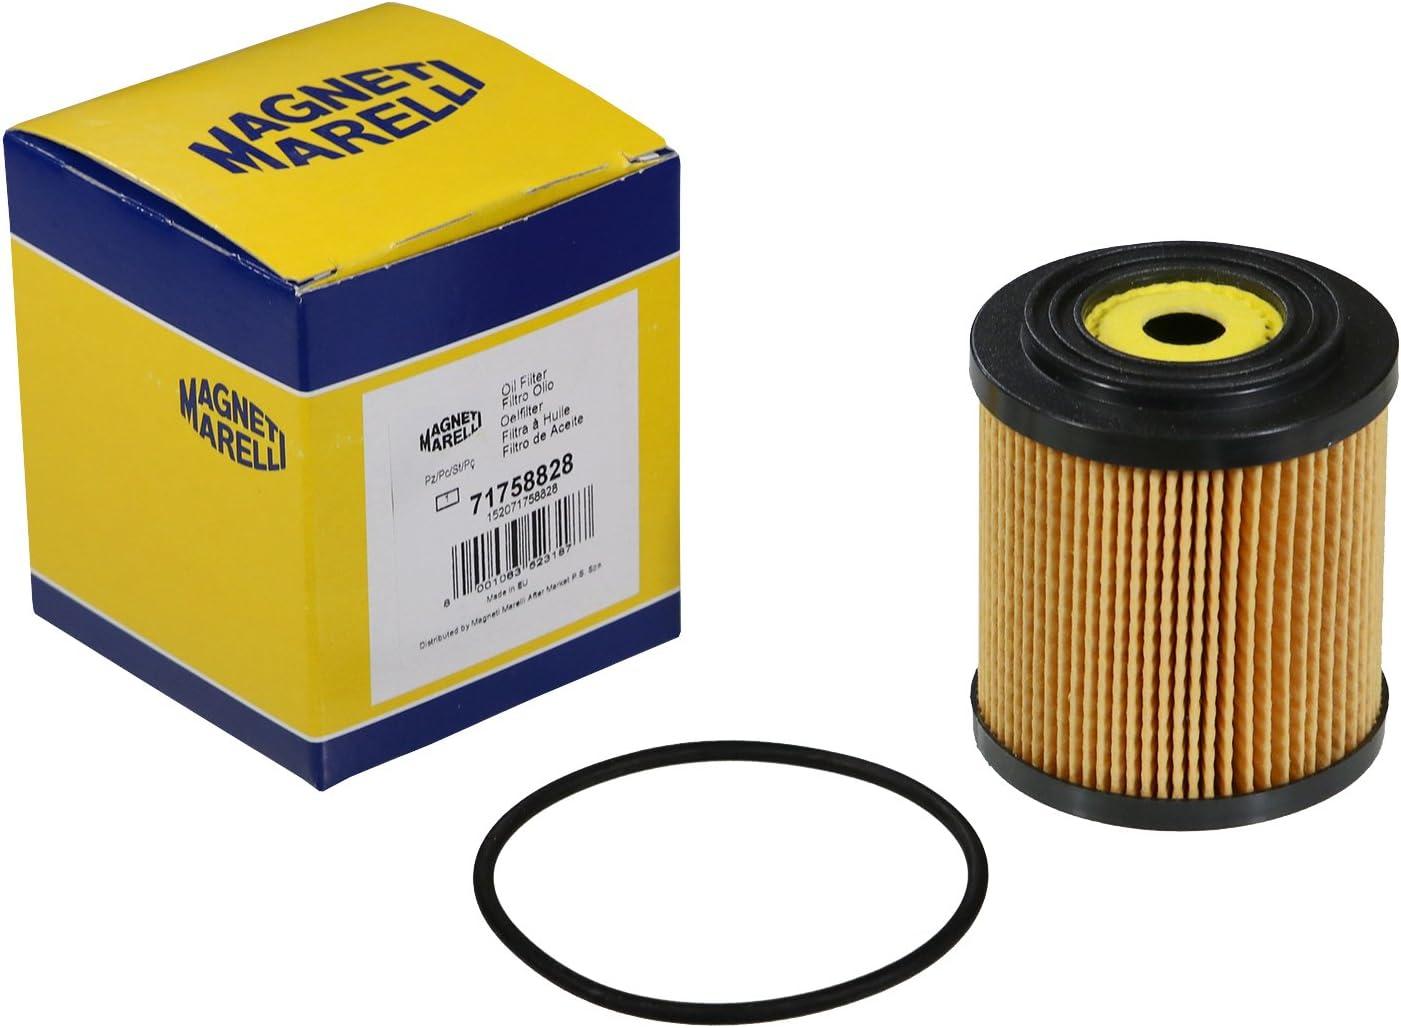 Magneti Marelli Oil Filter D1 72 D2 28 5 D3 16 5 Mm Height 81 Mm 7087808 Auto